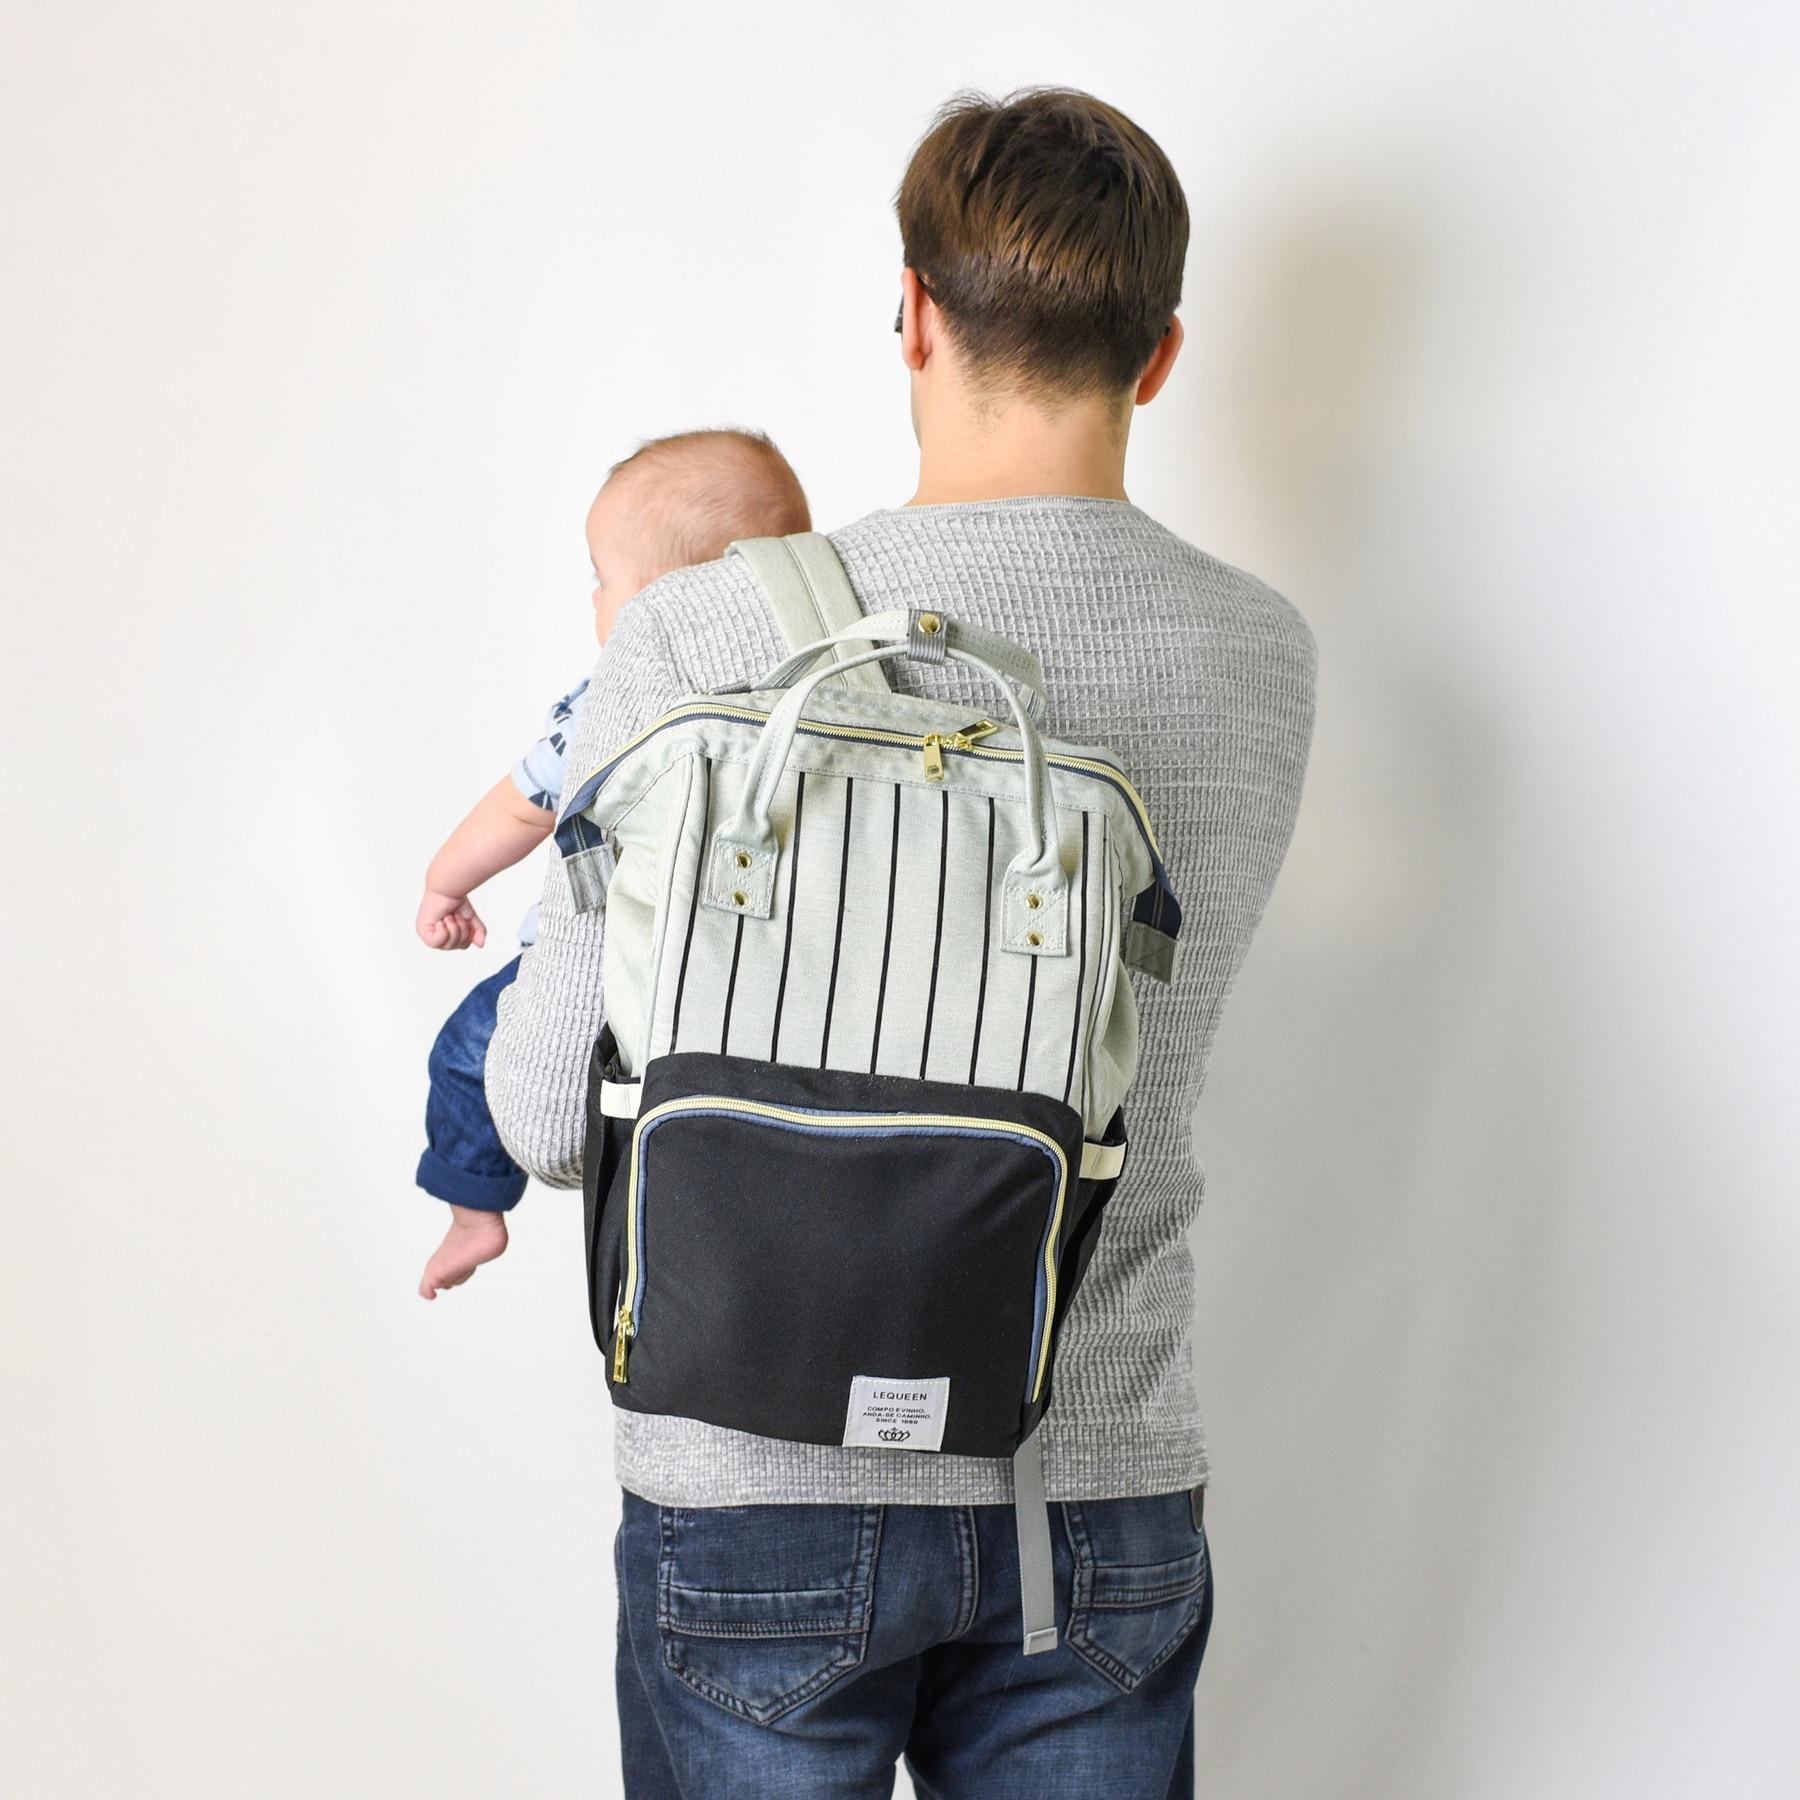 Maternity Bag Waterproof Diaper Backpack for Mom Nappy Bags Large Capacity Baby Bag Travel Mummy bag Maternity Bag Waterproof Diaper Backpack for Mom Nappy Bags Large Capacity Baby Bag Travel Mummy bag Designer Nursing Bag